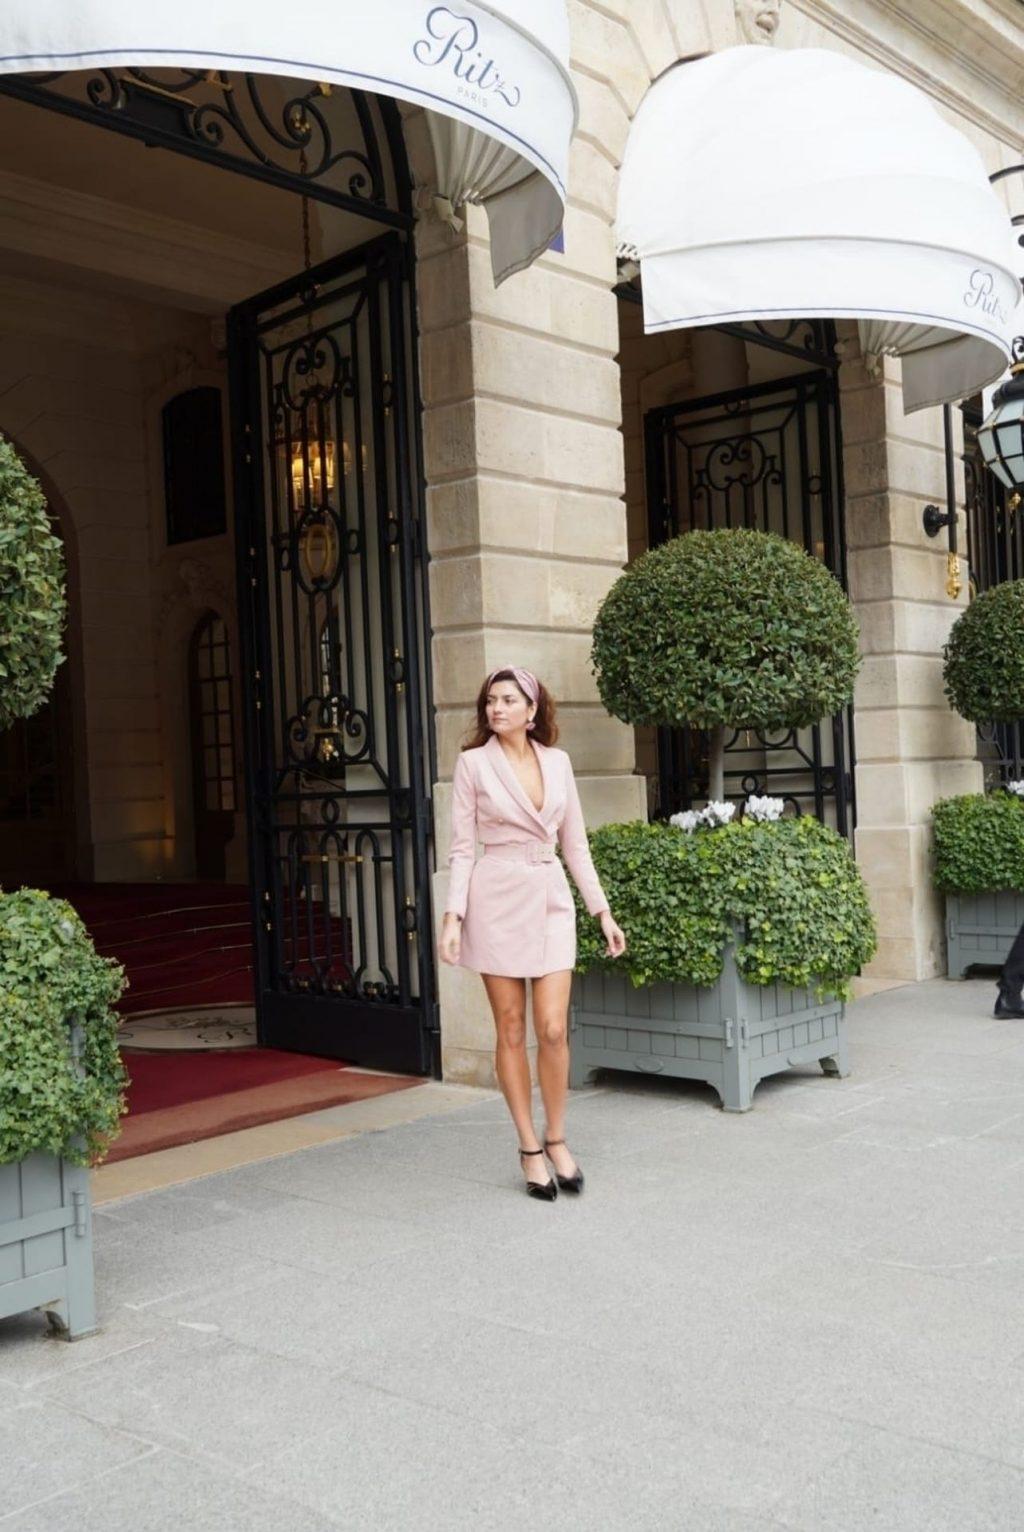 Blanca Blanco Poses in Paris During PFW (24 Photos)